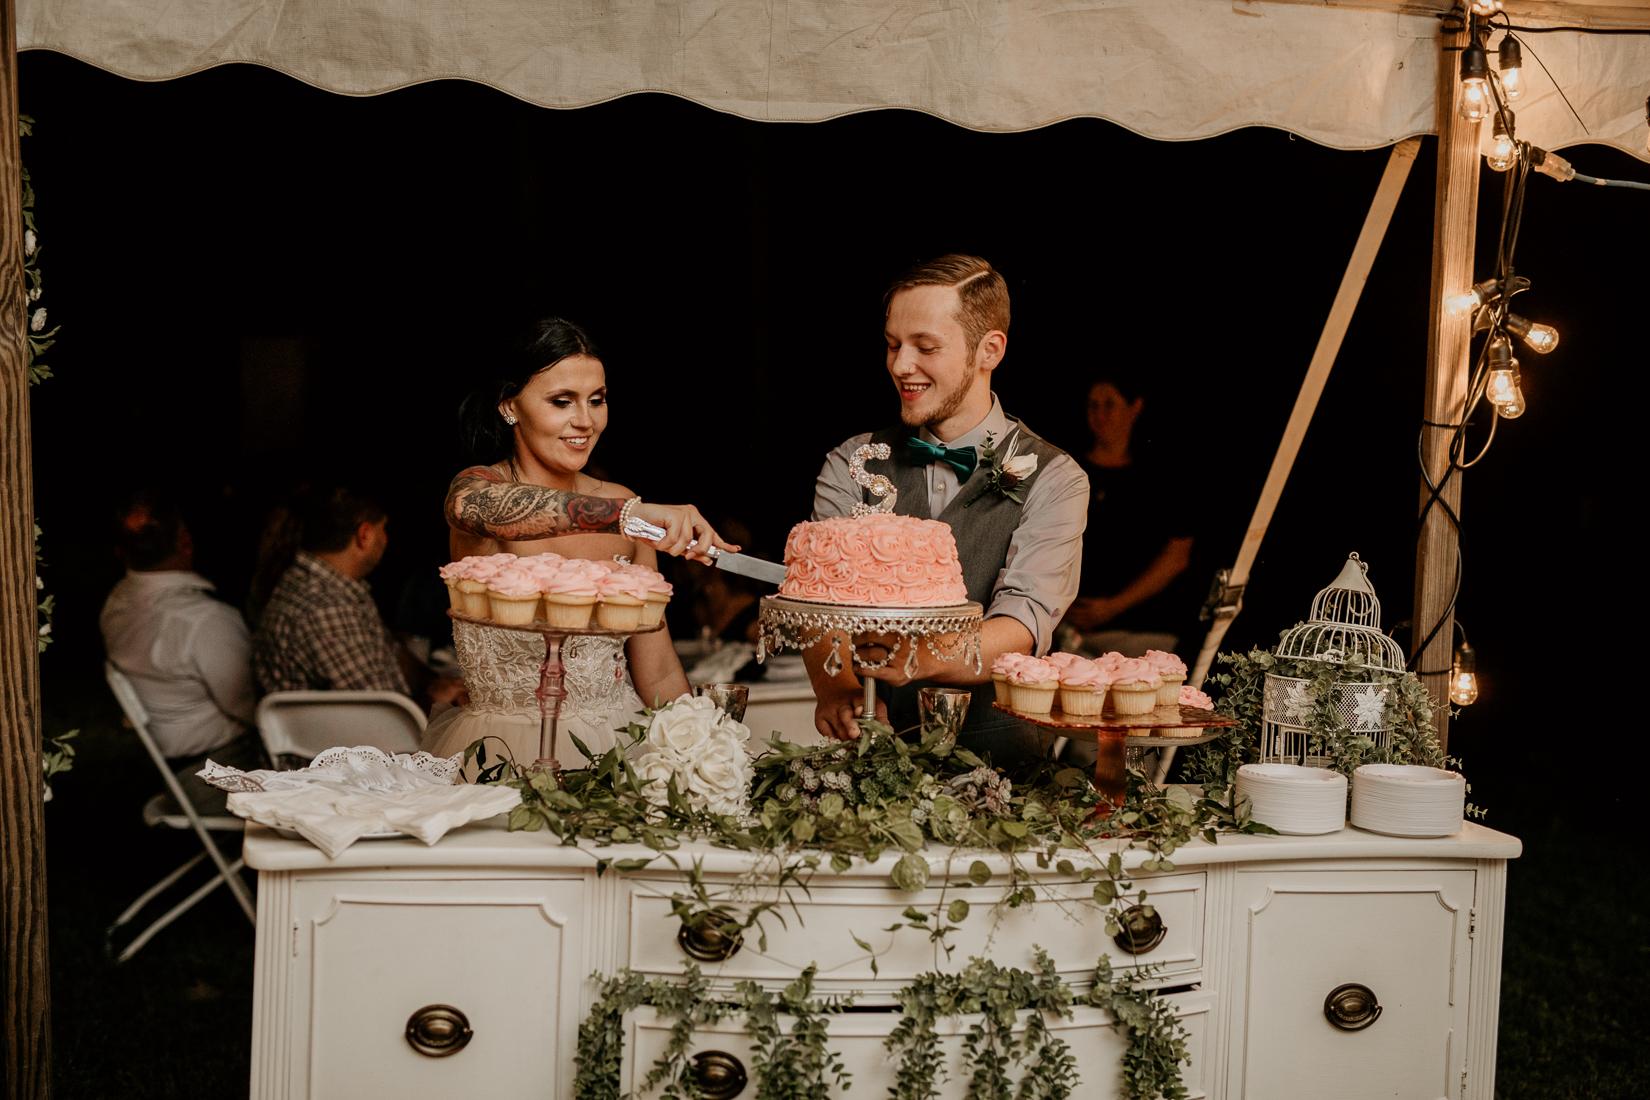 olivia_zay_wedding_09_2018-9935.jpg